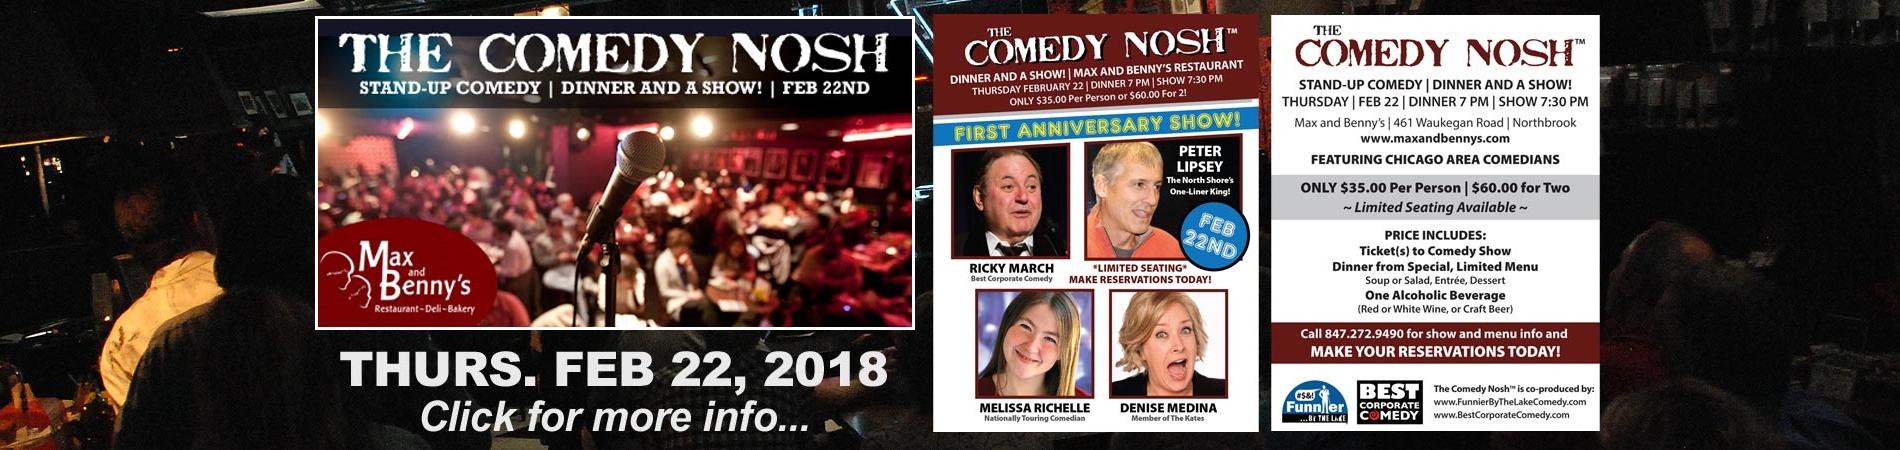 slider-comedynosh-02-2018